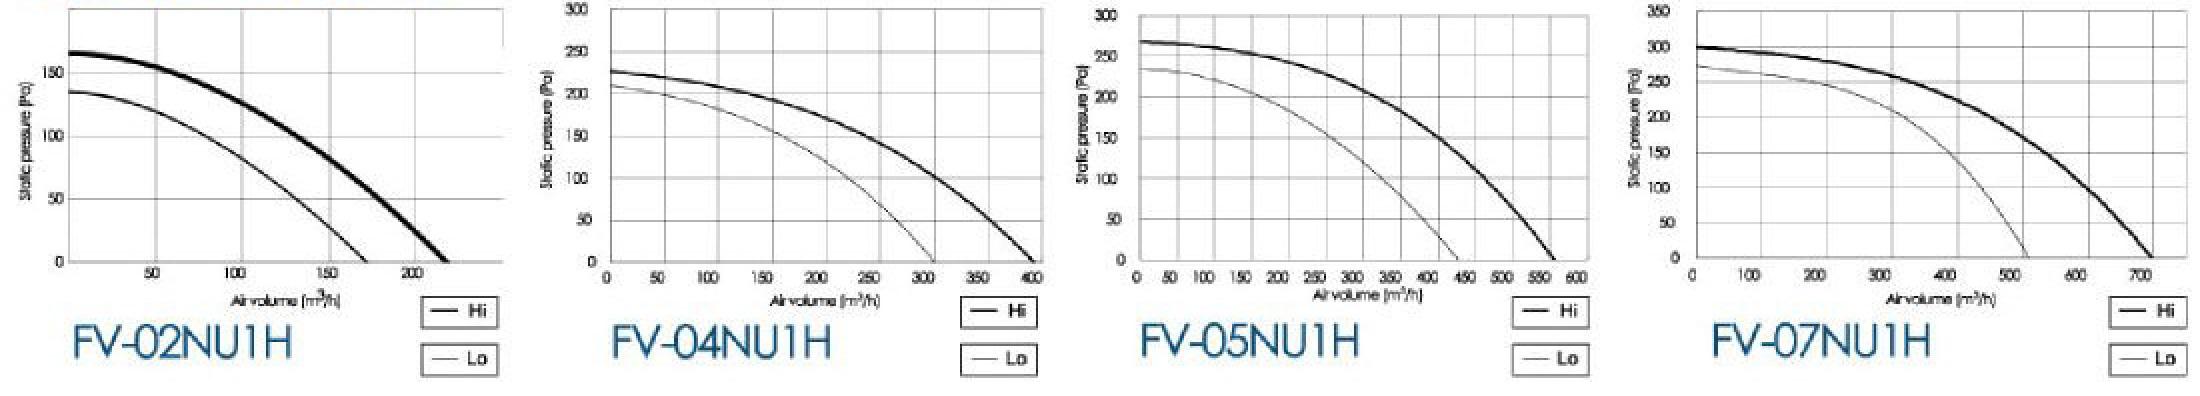 panasonic cabinet fan air volume